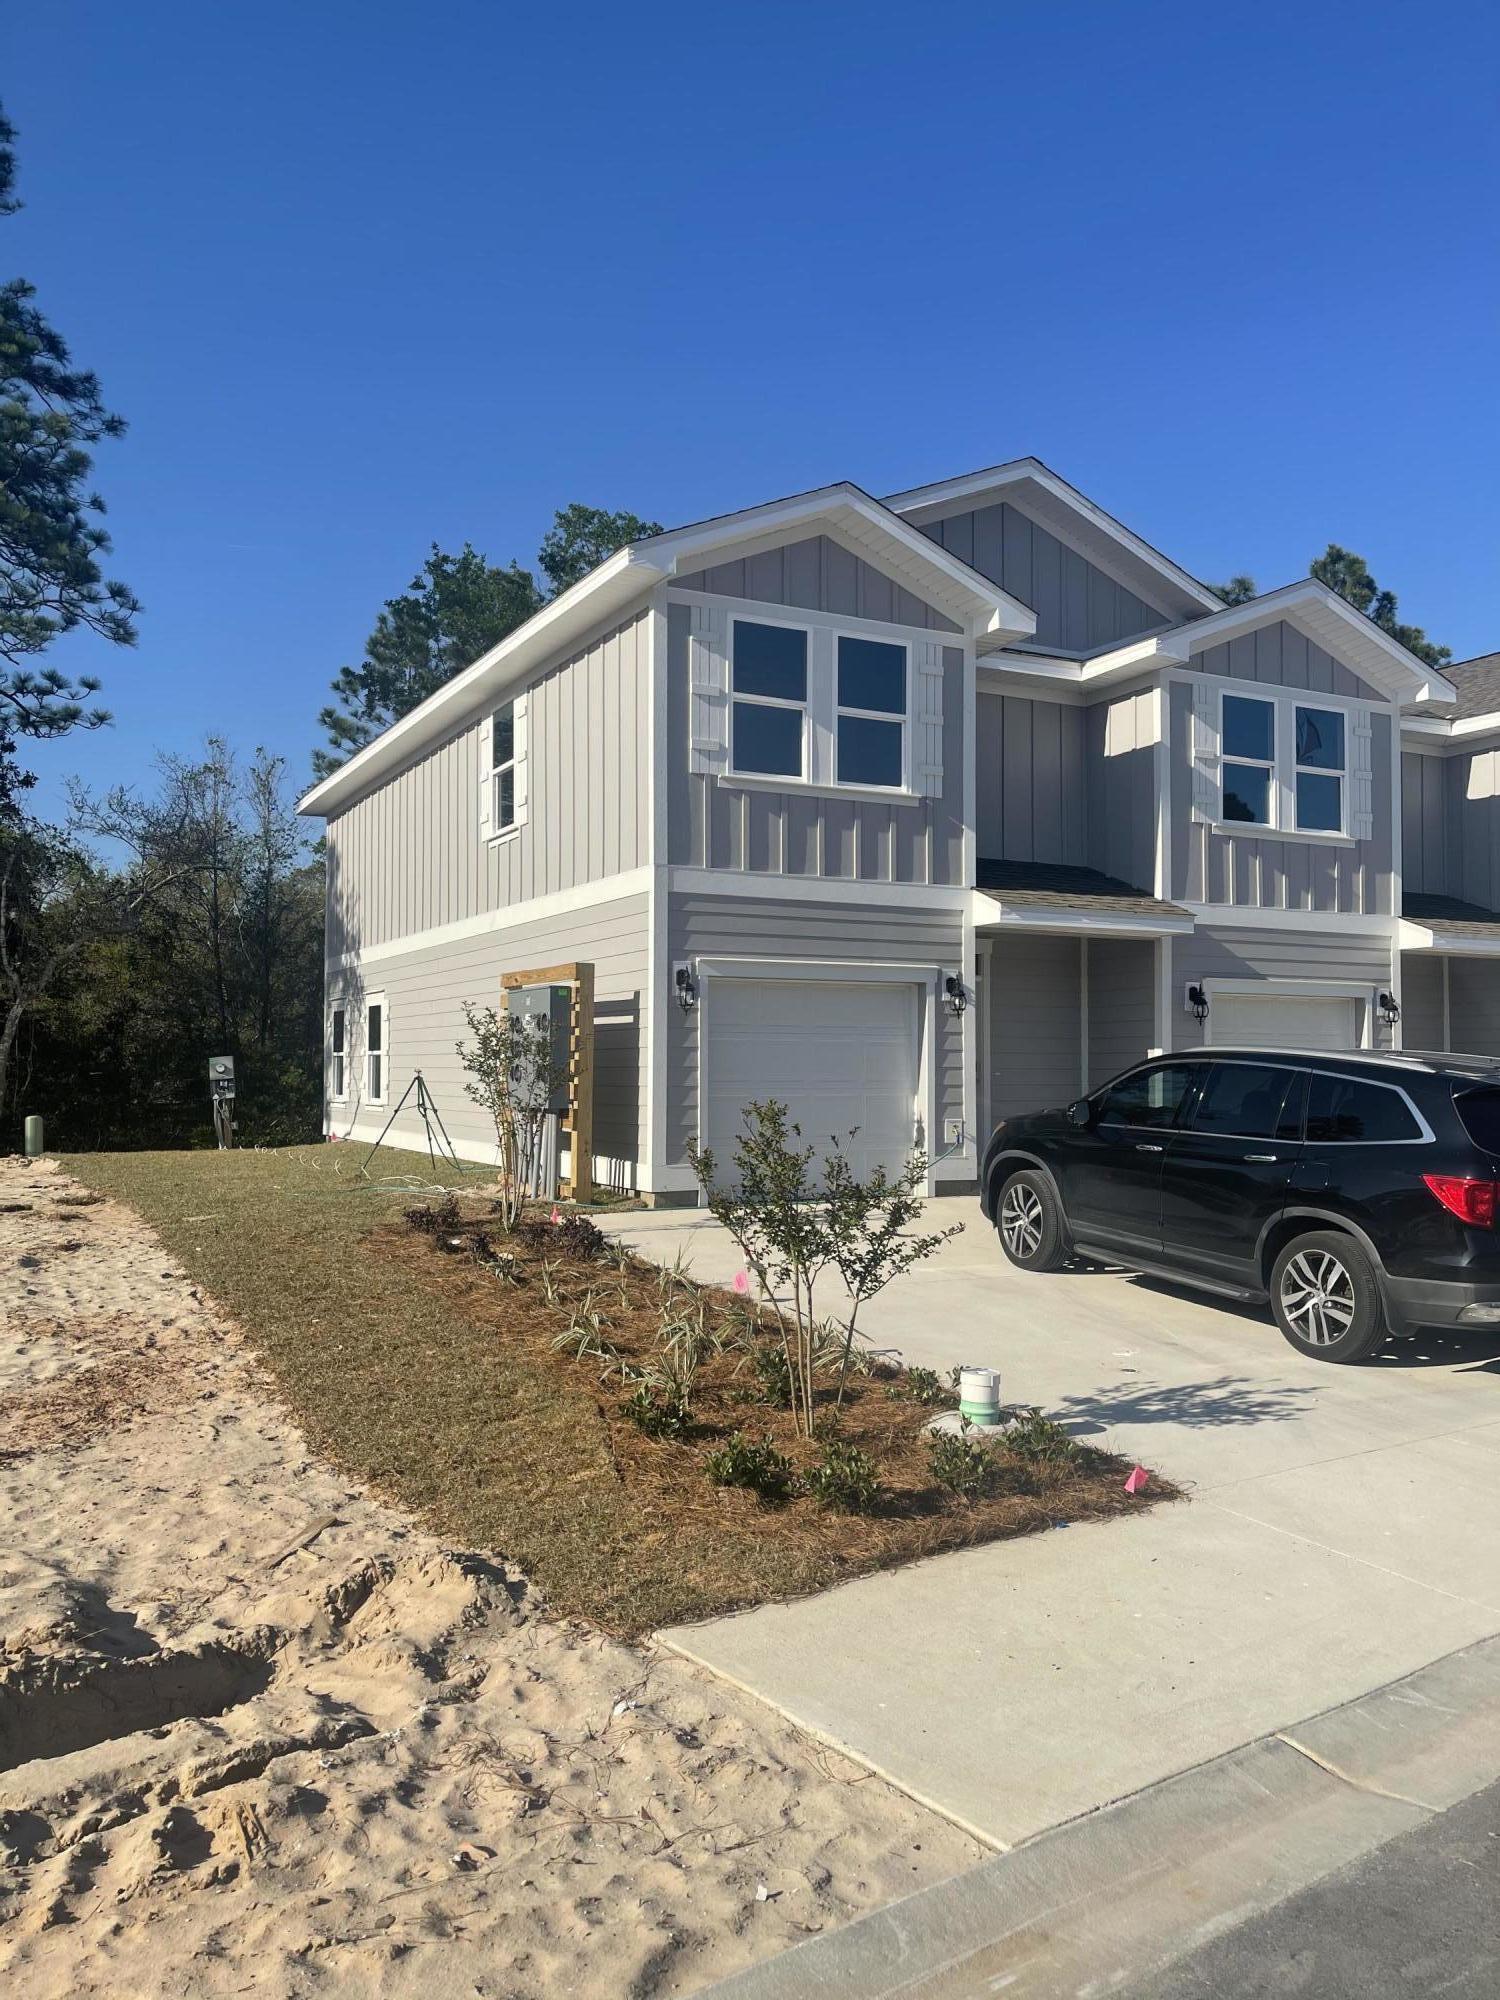 Photo of home for sale at 34 Sandhill Pines, Santa Rosa Beach FL